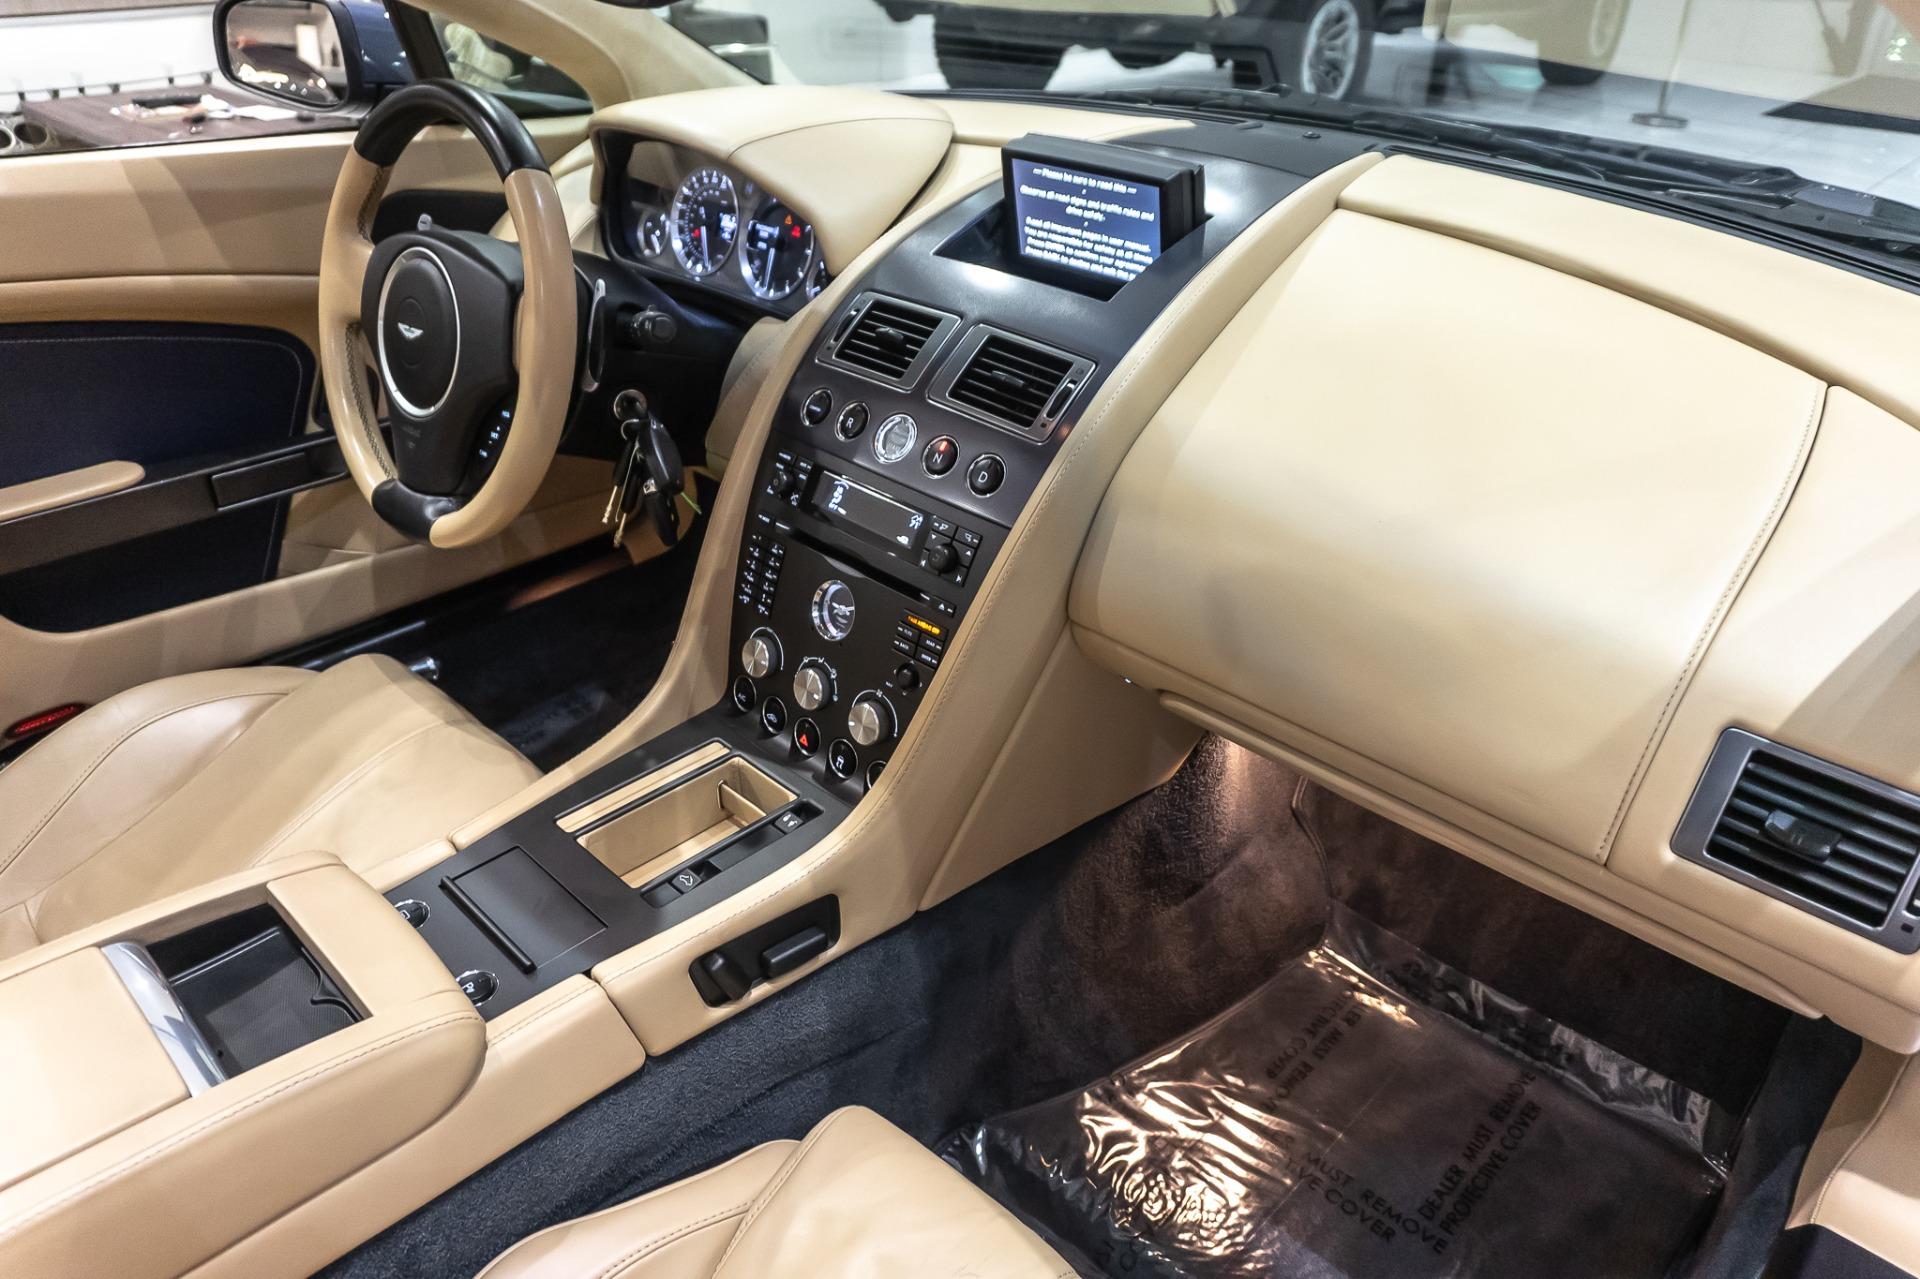 Used-2008-Aston-Martin-V8-Vantage-Roadster-NEW-CLUTCH-SERVICE-RECORDS-NAV-LOADED